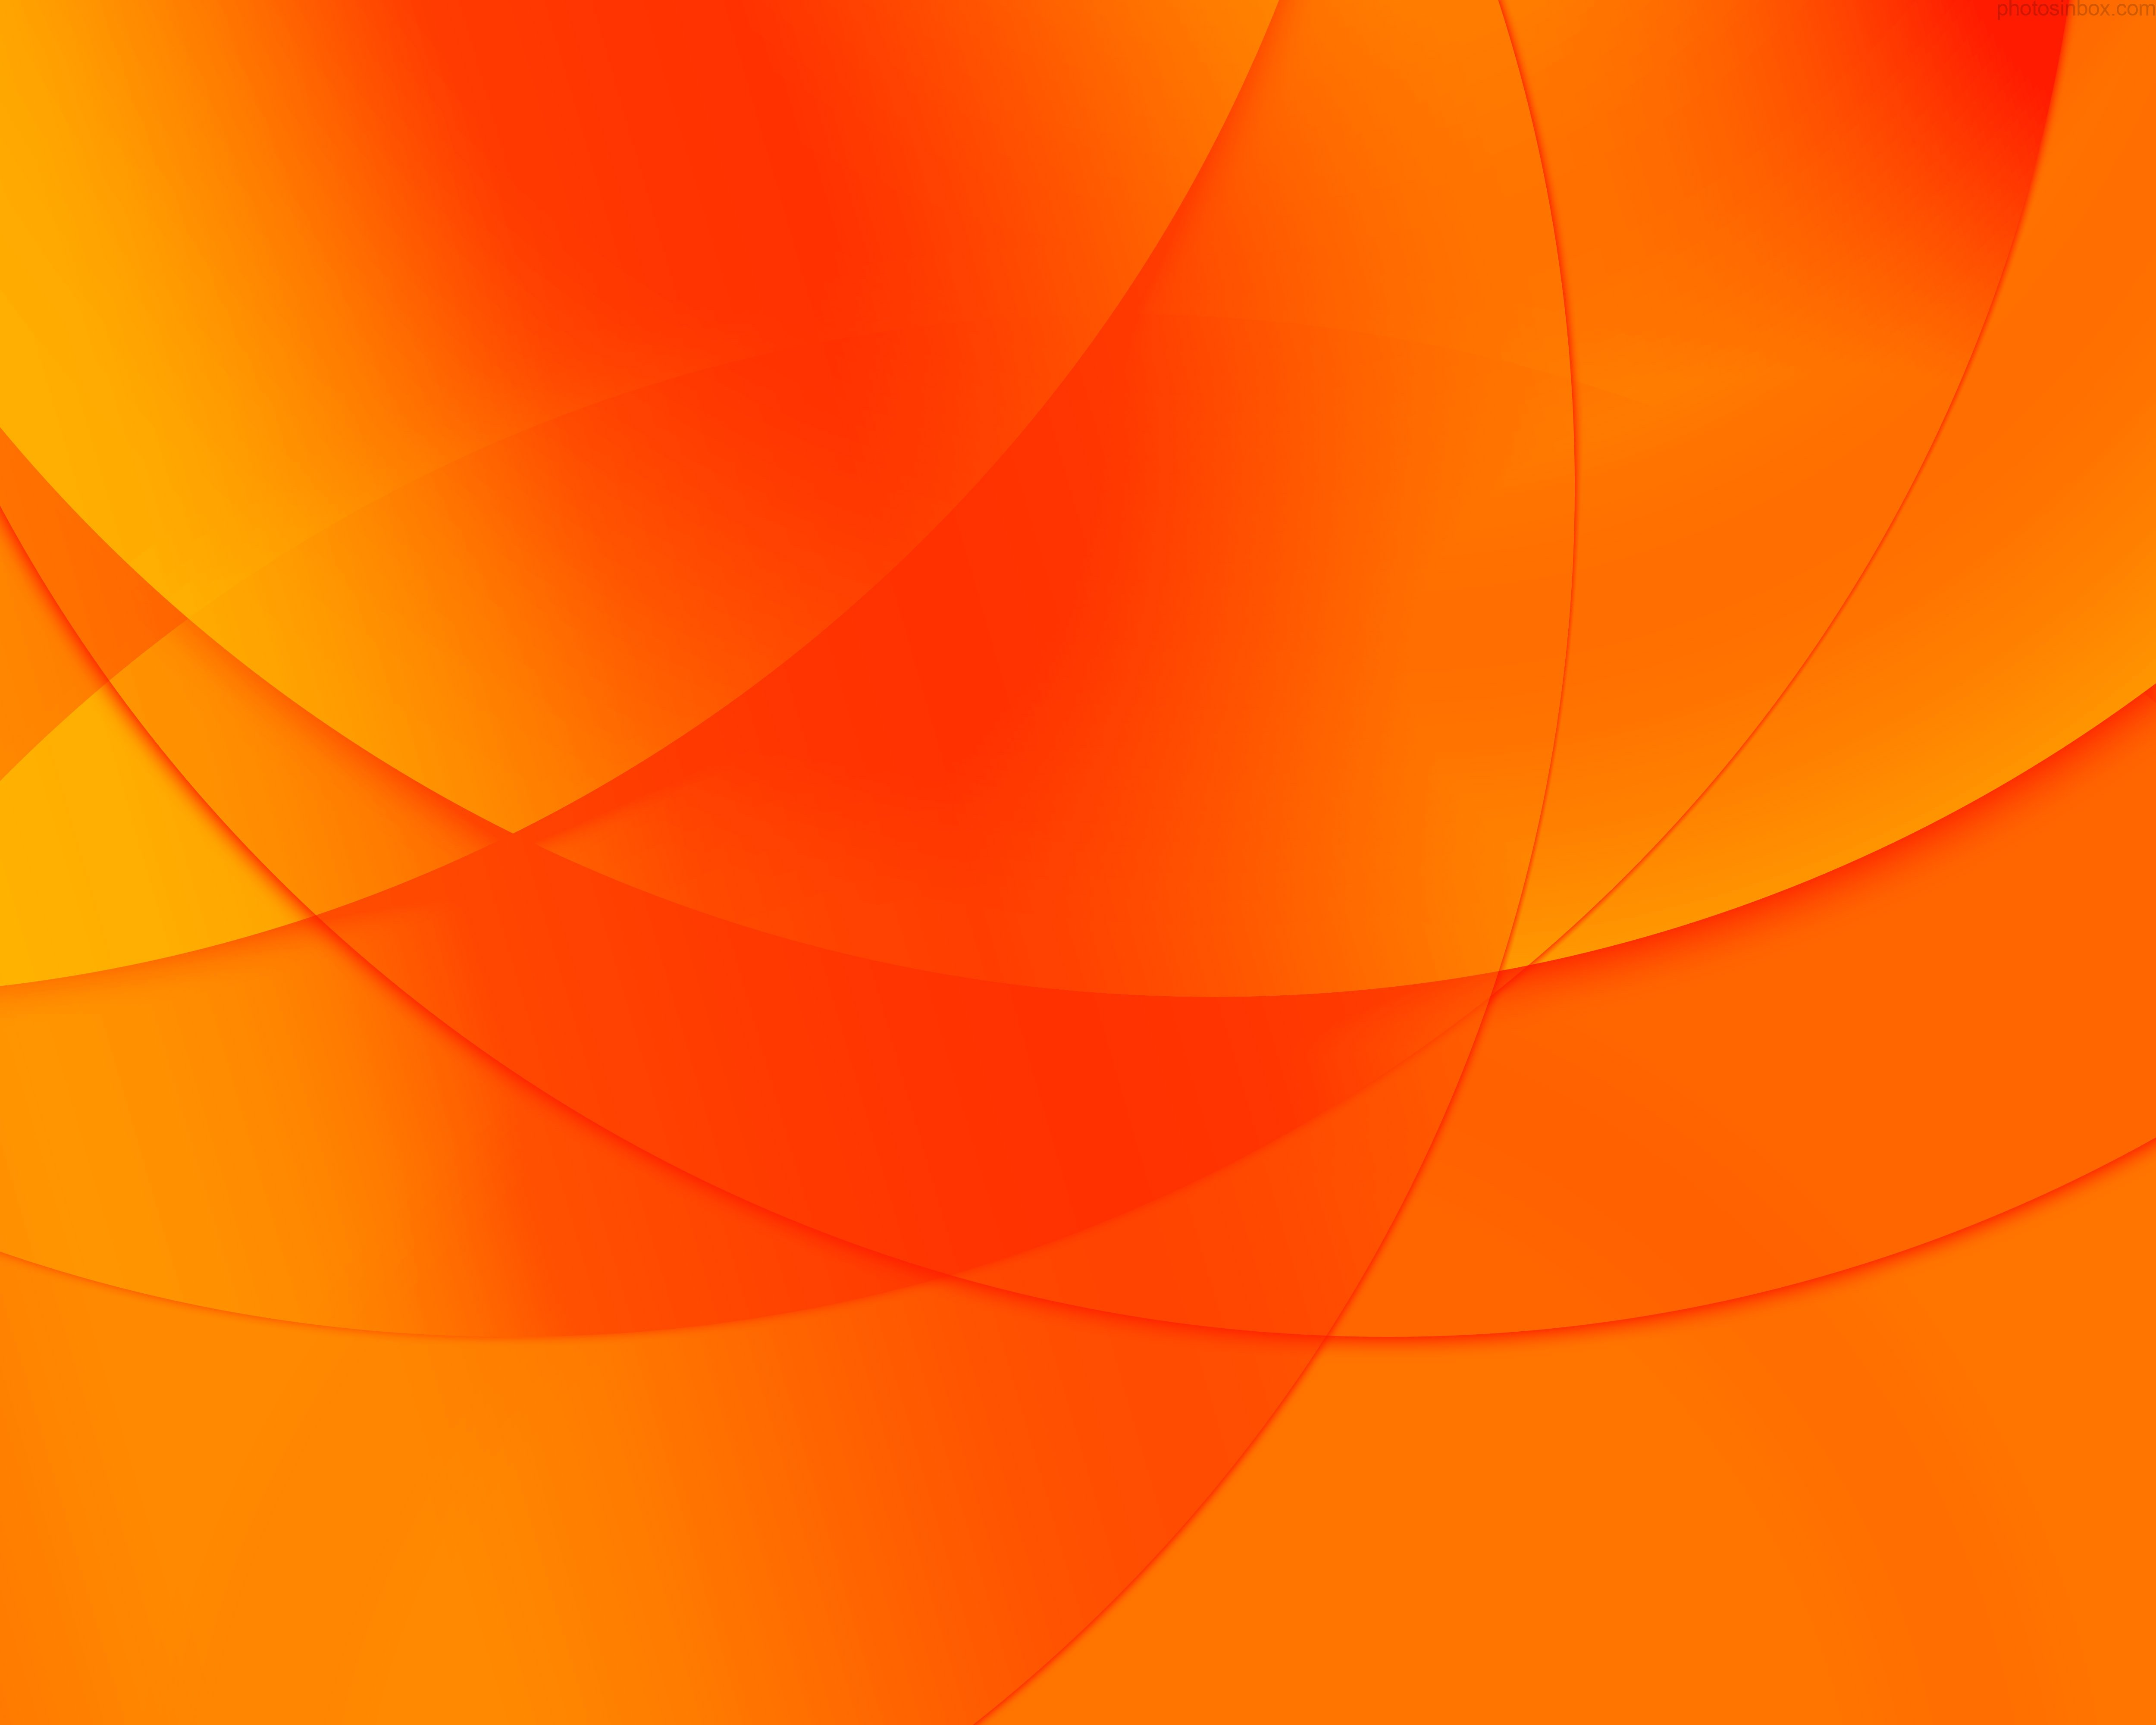 wallpaper Orange Backgrounds hd wallpaper background desktop 5000x4000